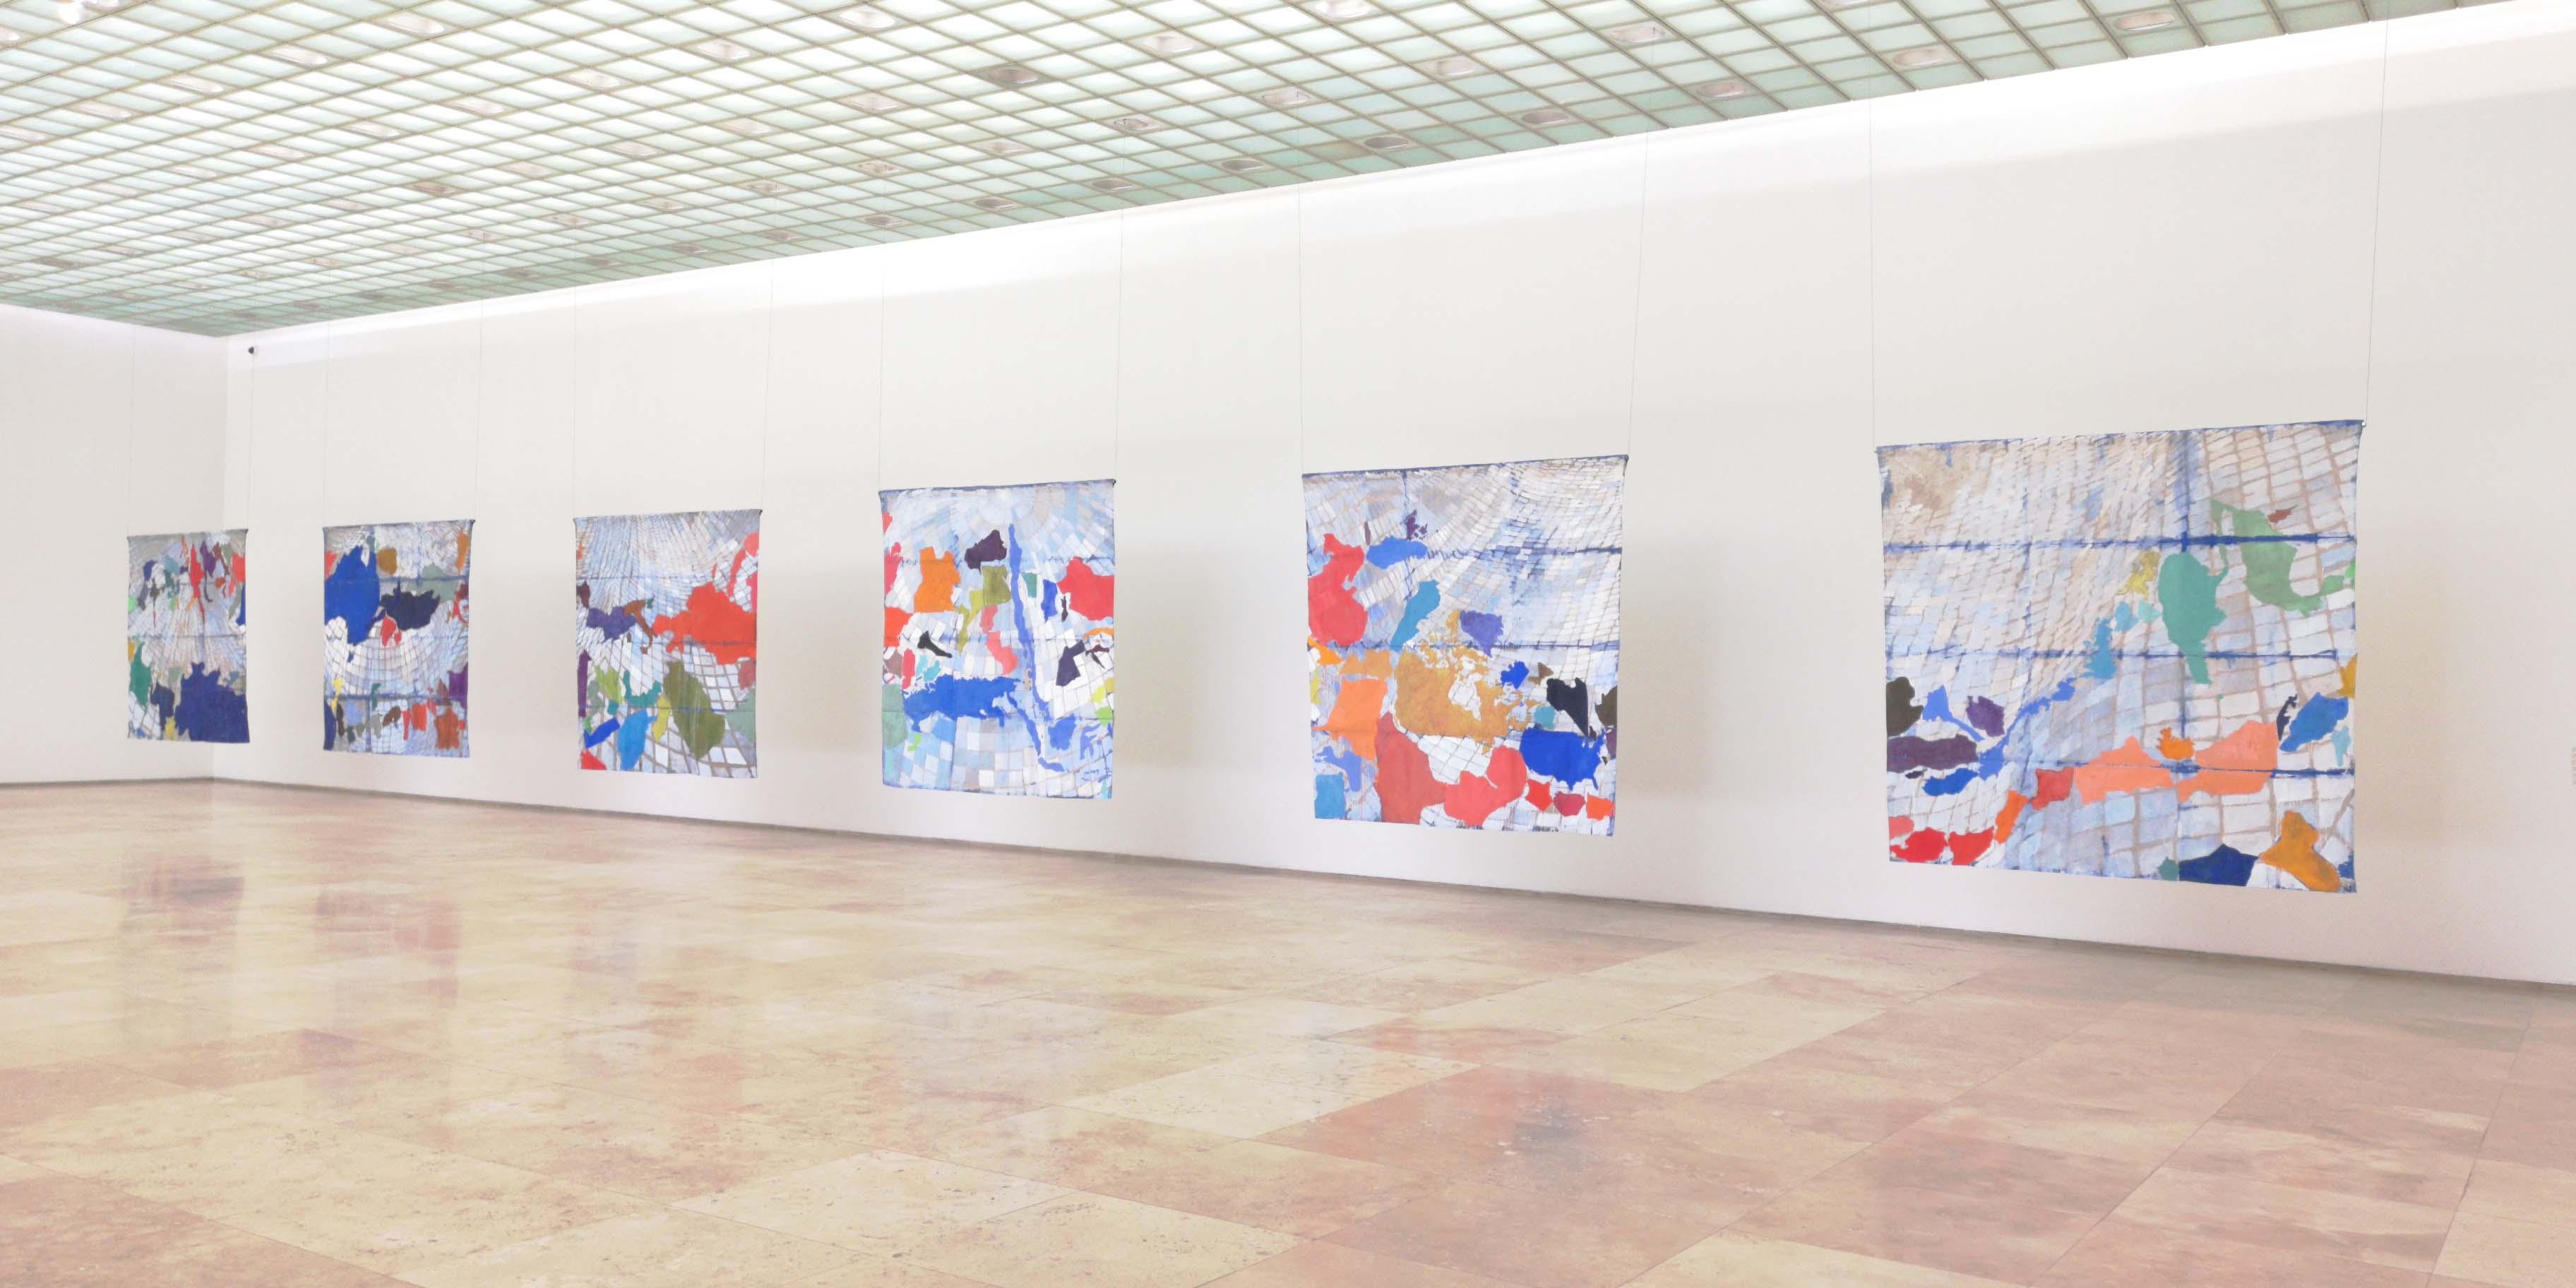 Installation view, DANCE AROUND ME, 2019, pigments on linen canvas, 205 x 1362 cm .jpg